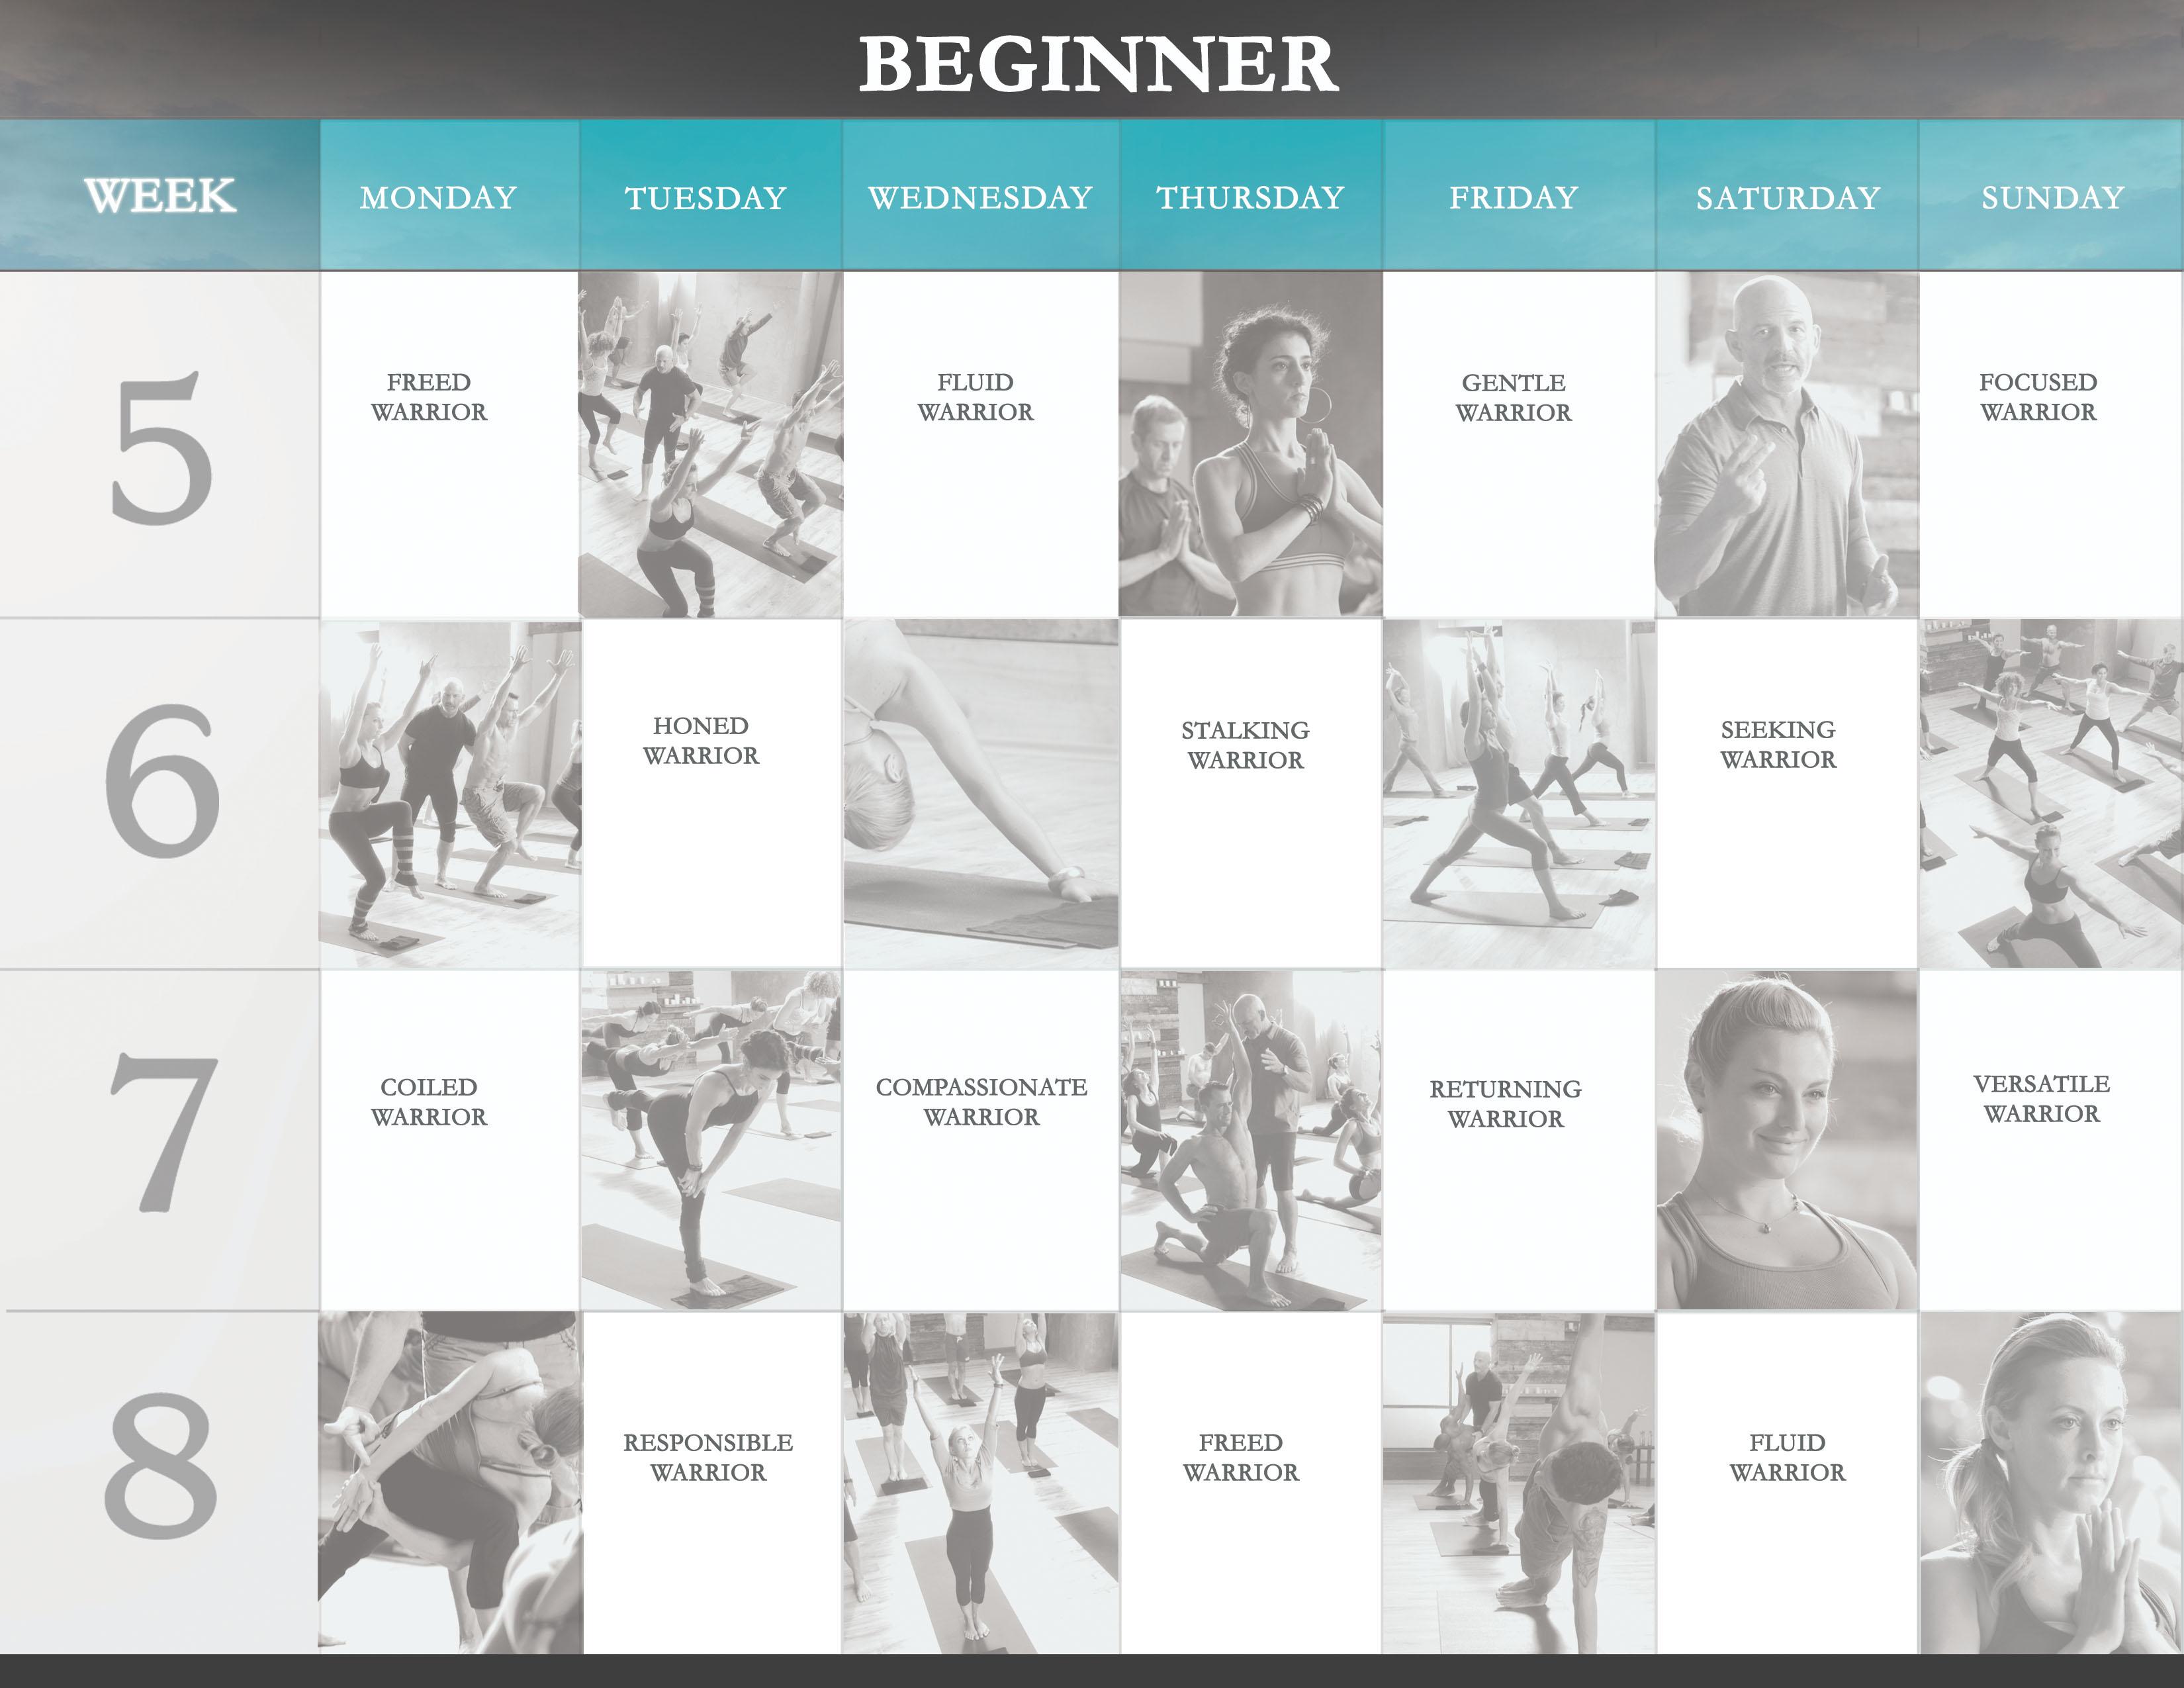 YW_beginner_cal-2